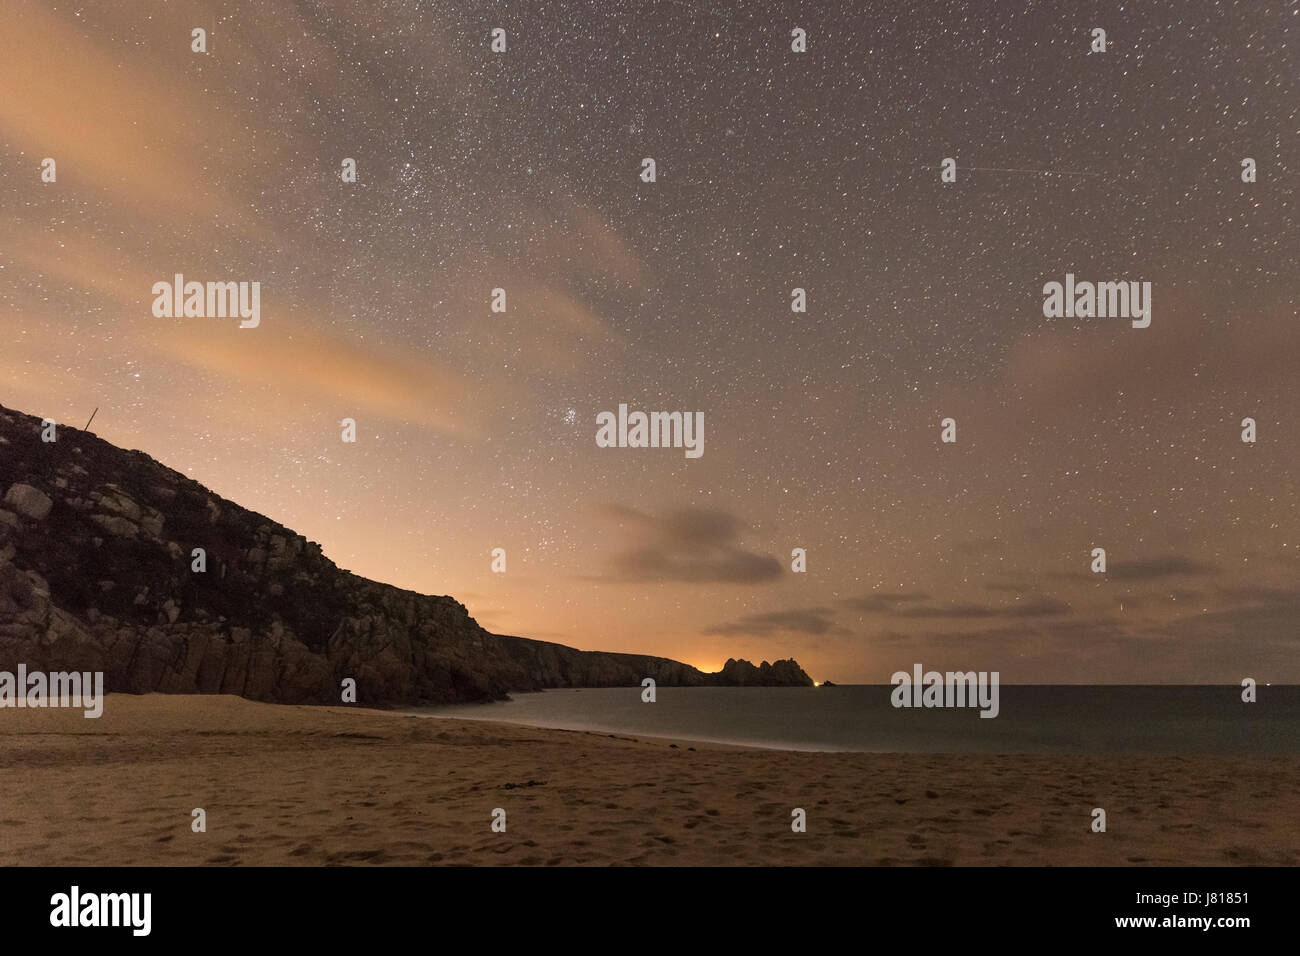 Stars from Porthcurno Beach, Night Sky - Porthcurno, Cornwall, UK - Stock Image